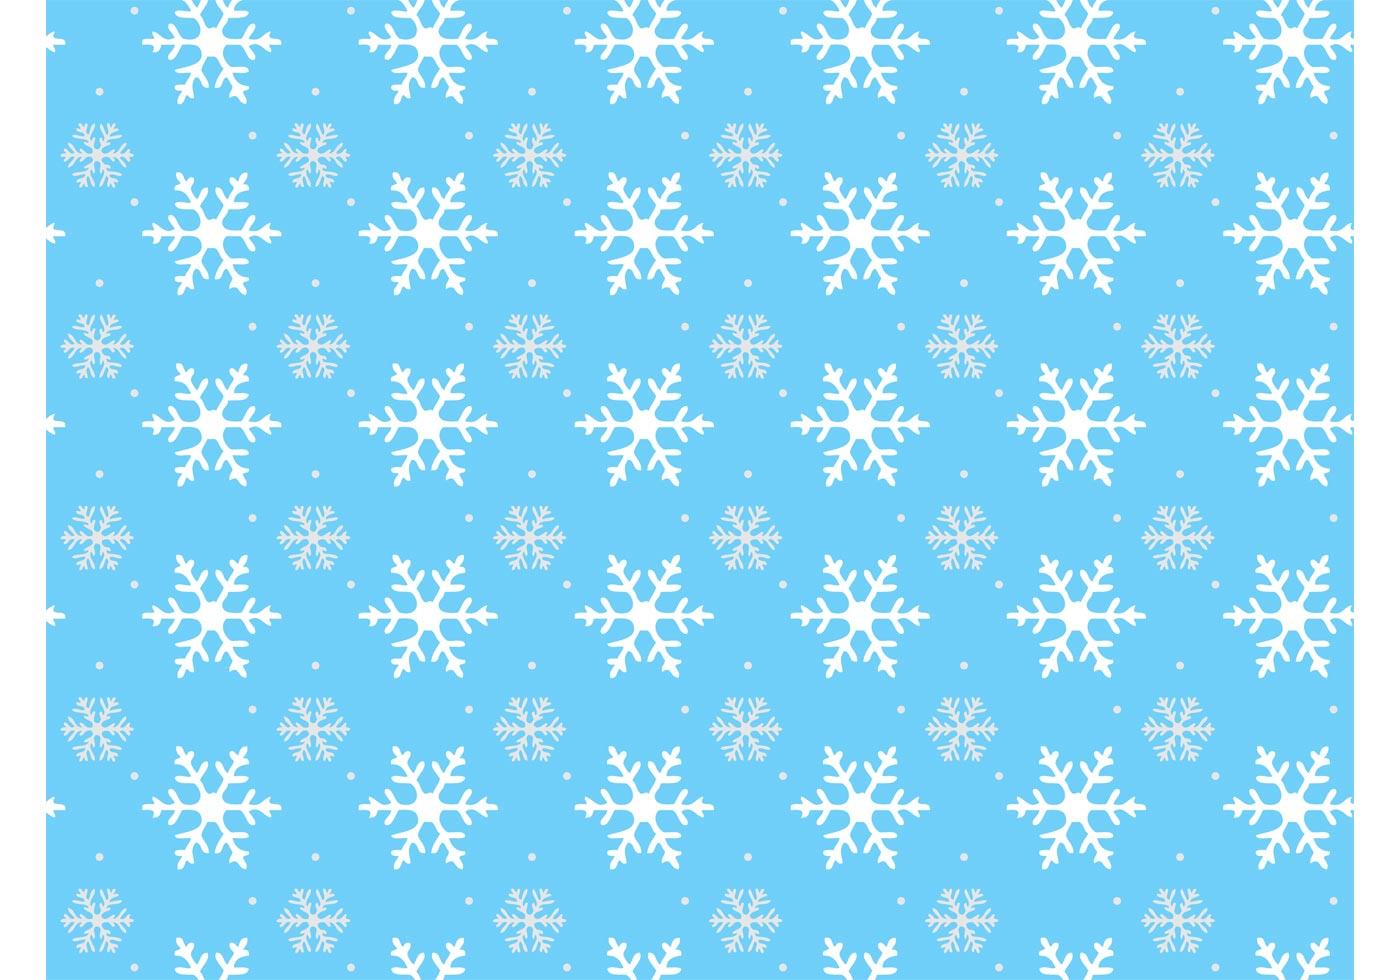 snowflake pattern free vector art